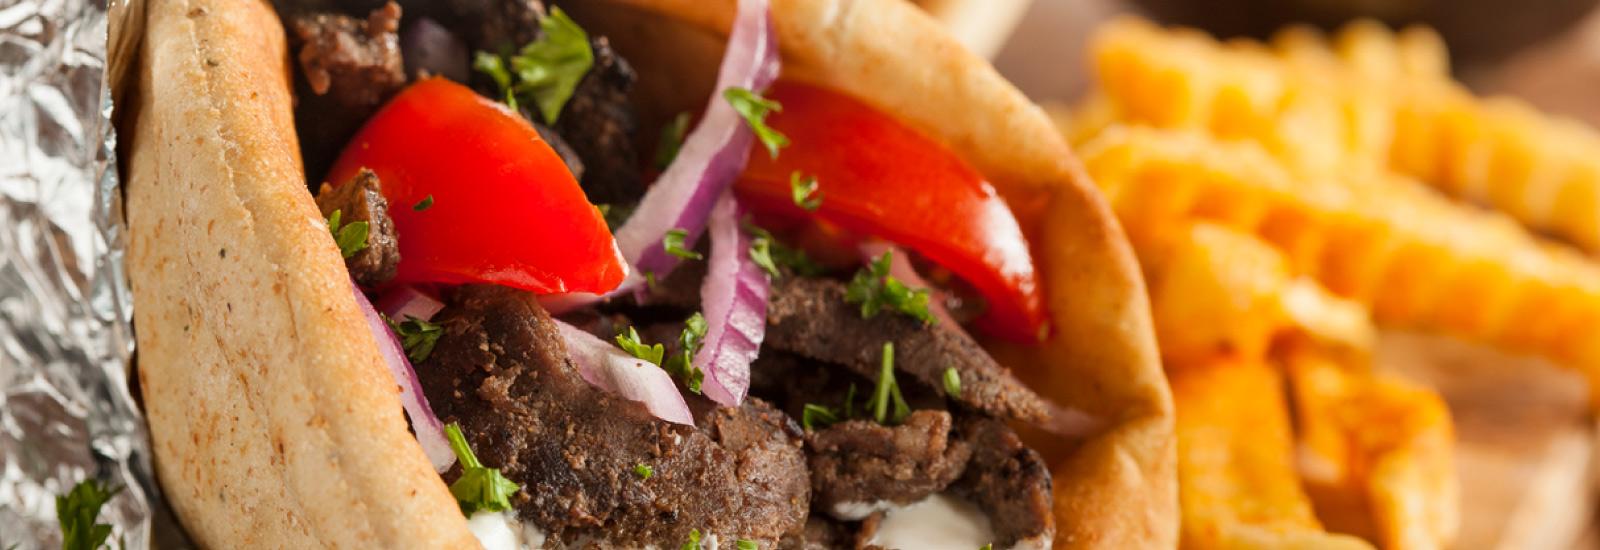 Meat The Greek, Colorado Springs, CO